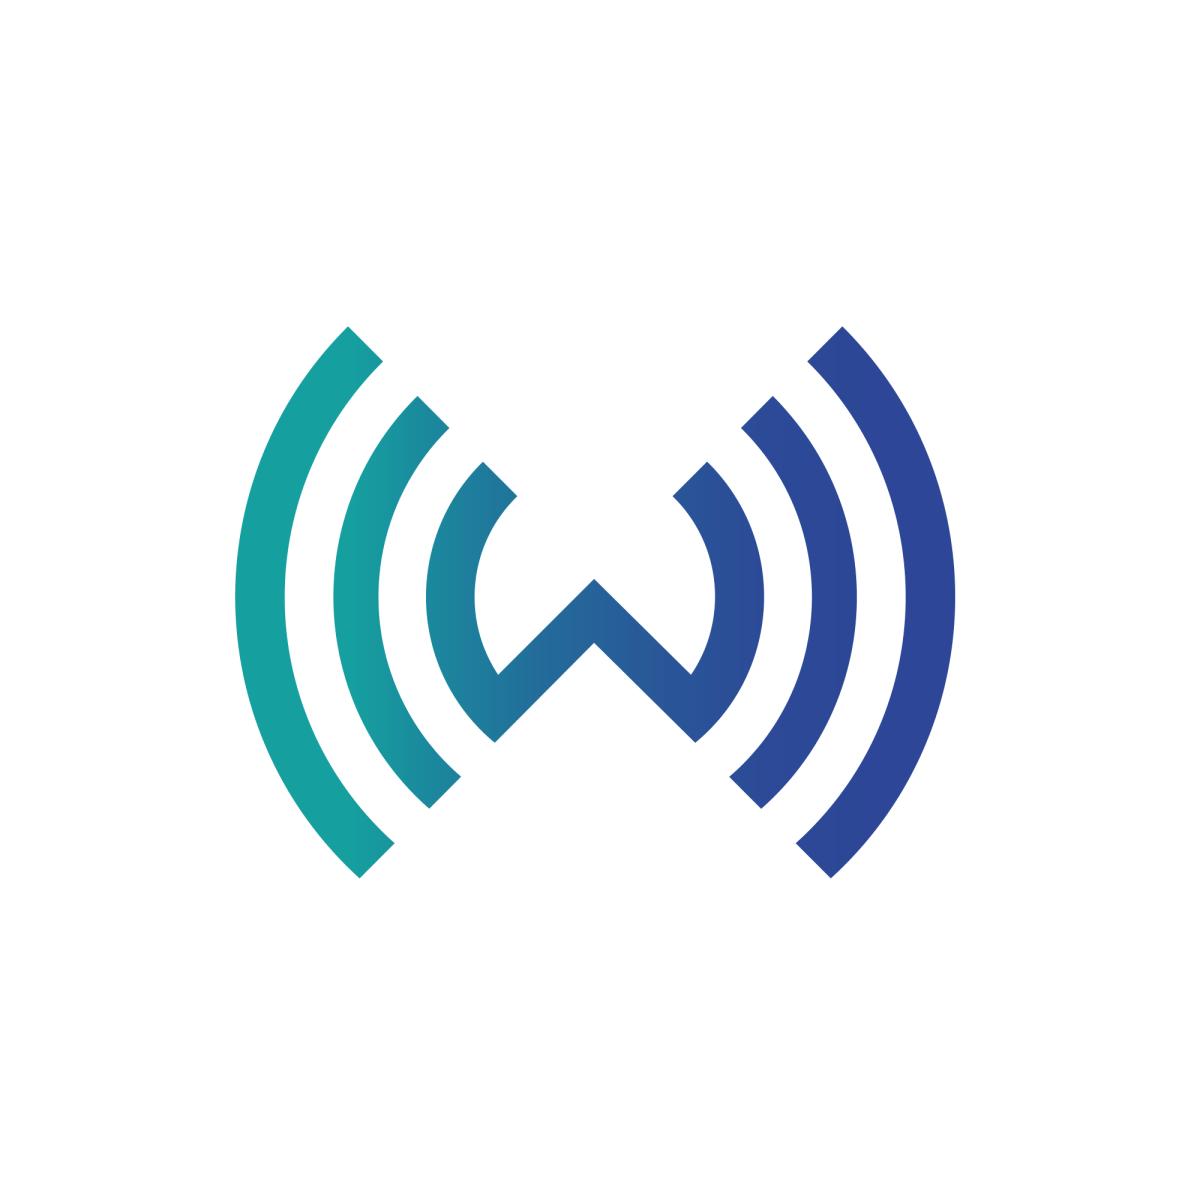 Wireless Group Logo United Kingdom W Logos Letter Logo Single Letter Logo